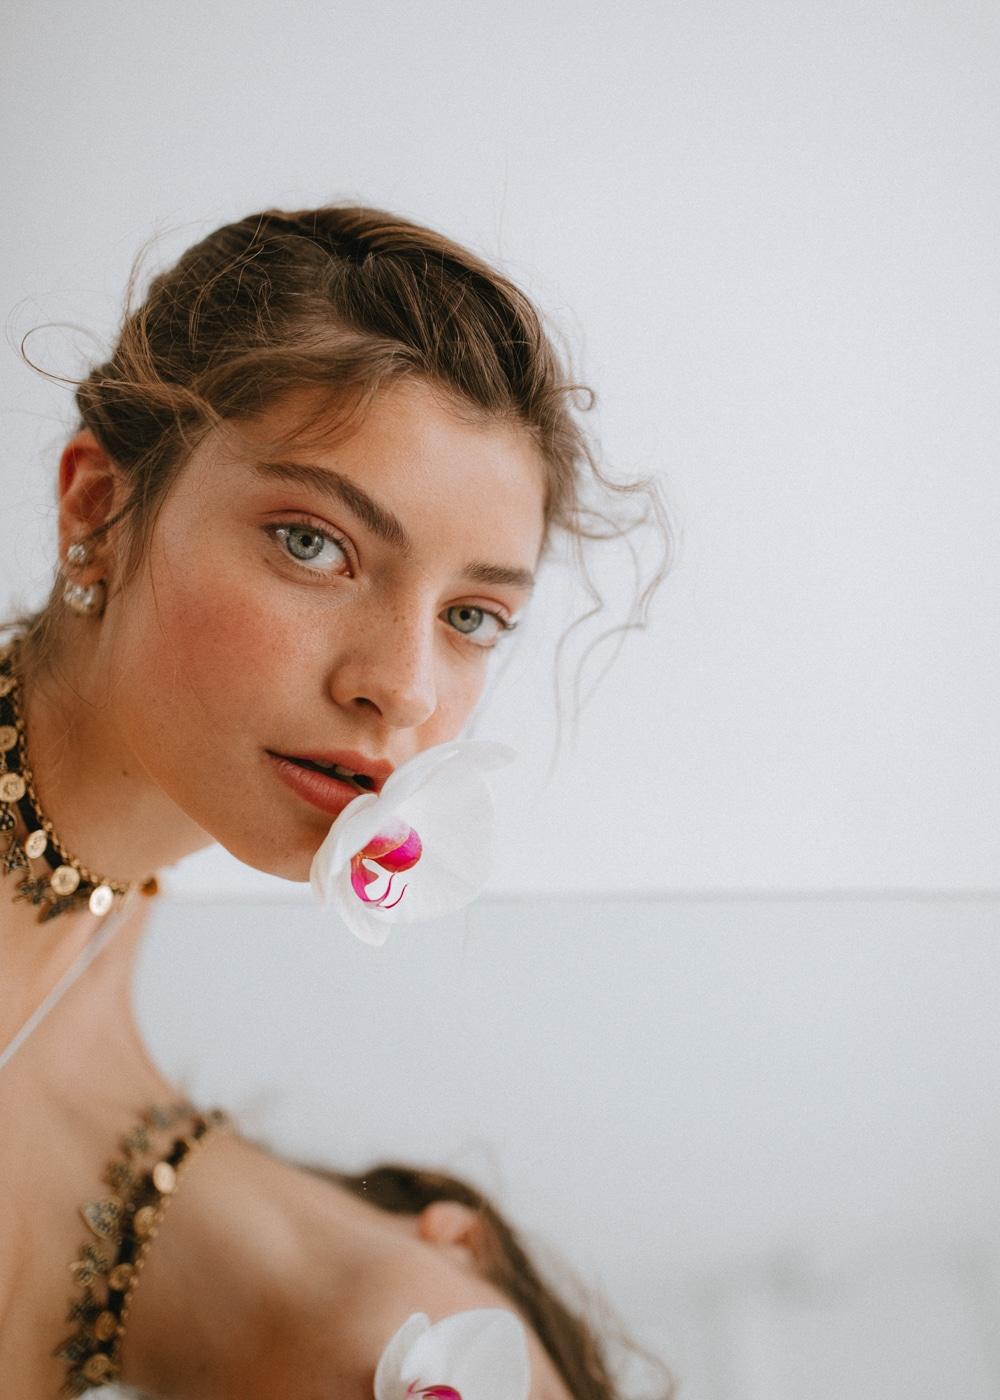 Glamour-Mexico-September-2018-Melina-Martin-Kapturing-1.jpg